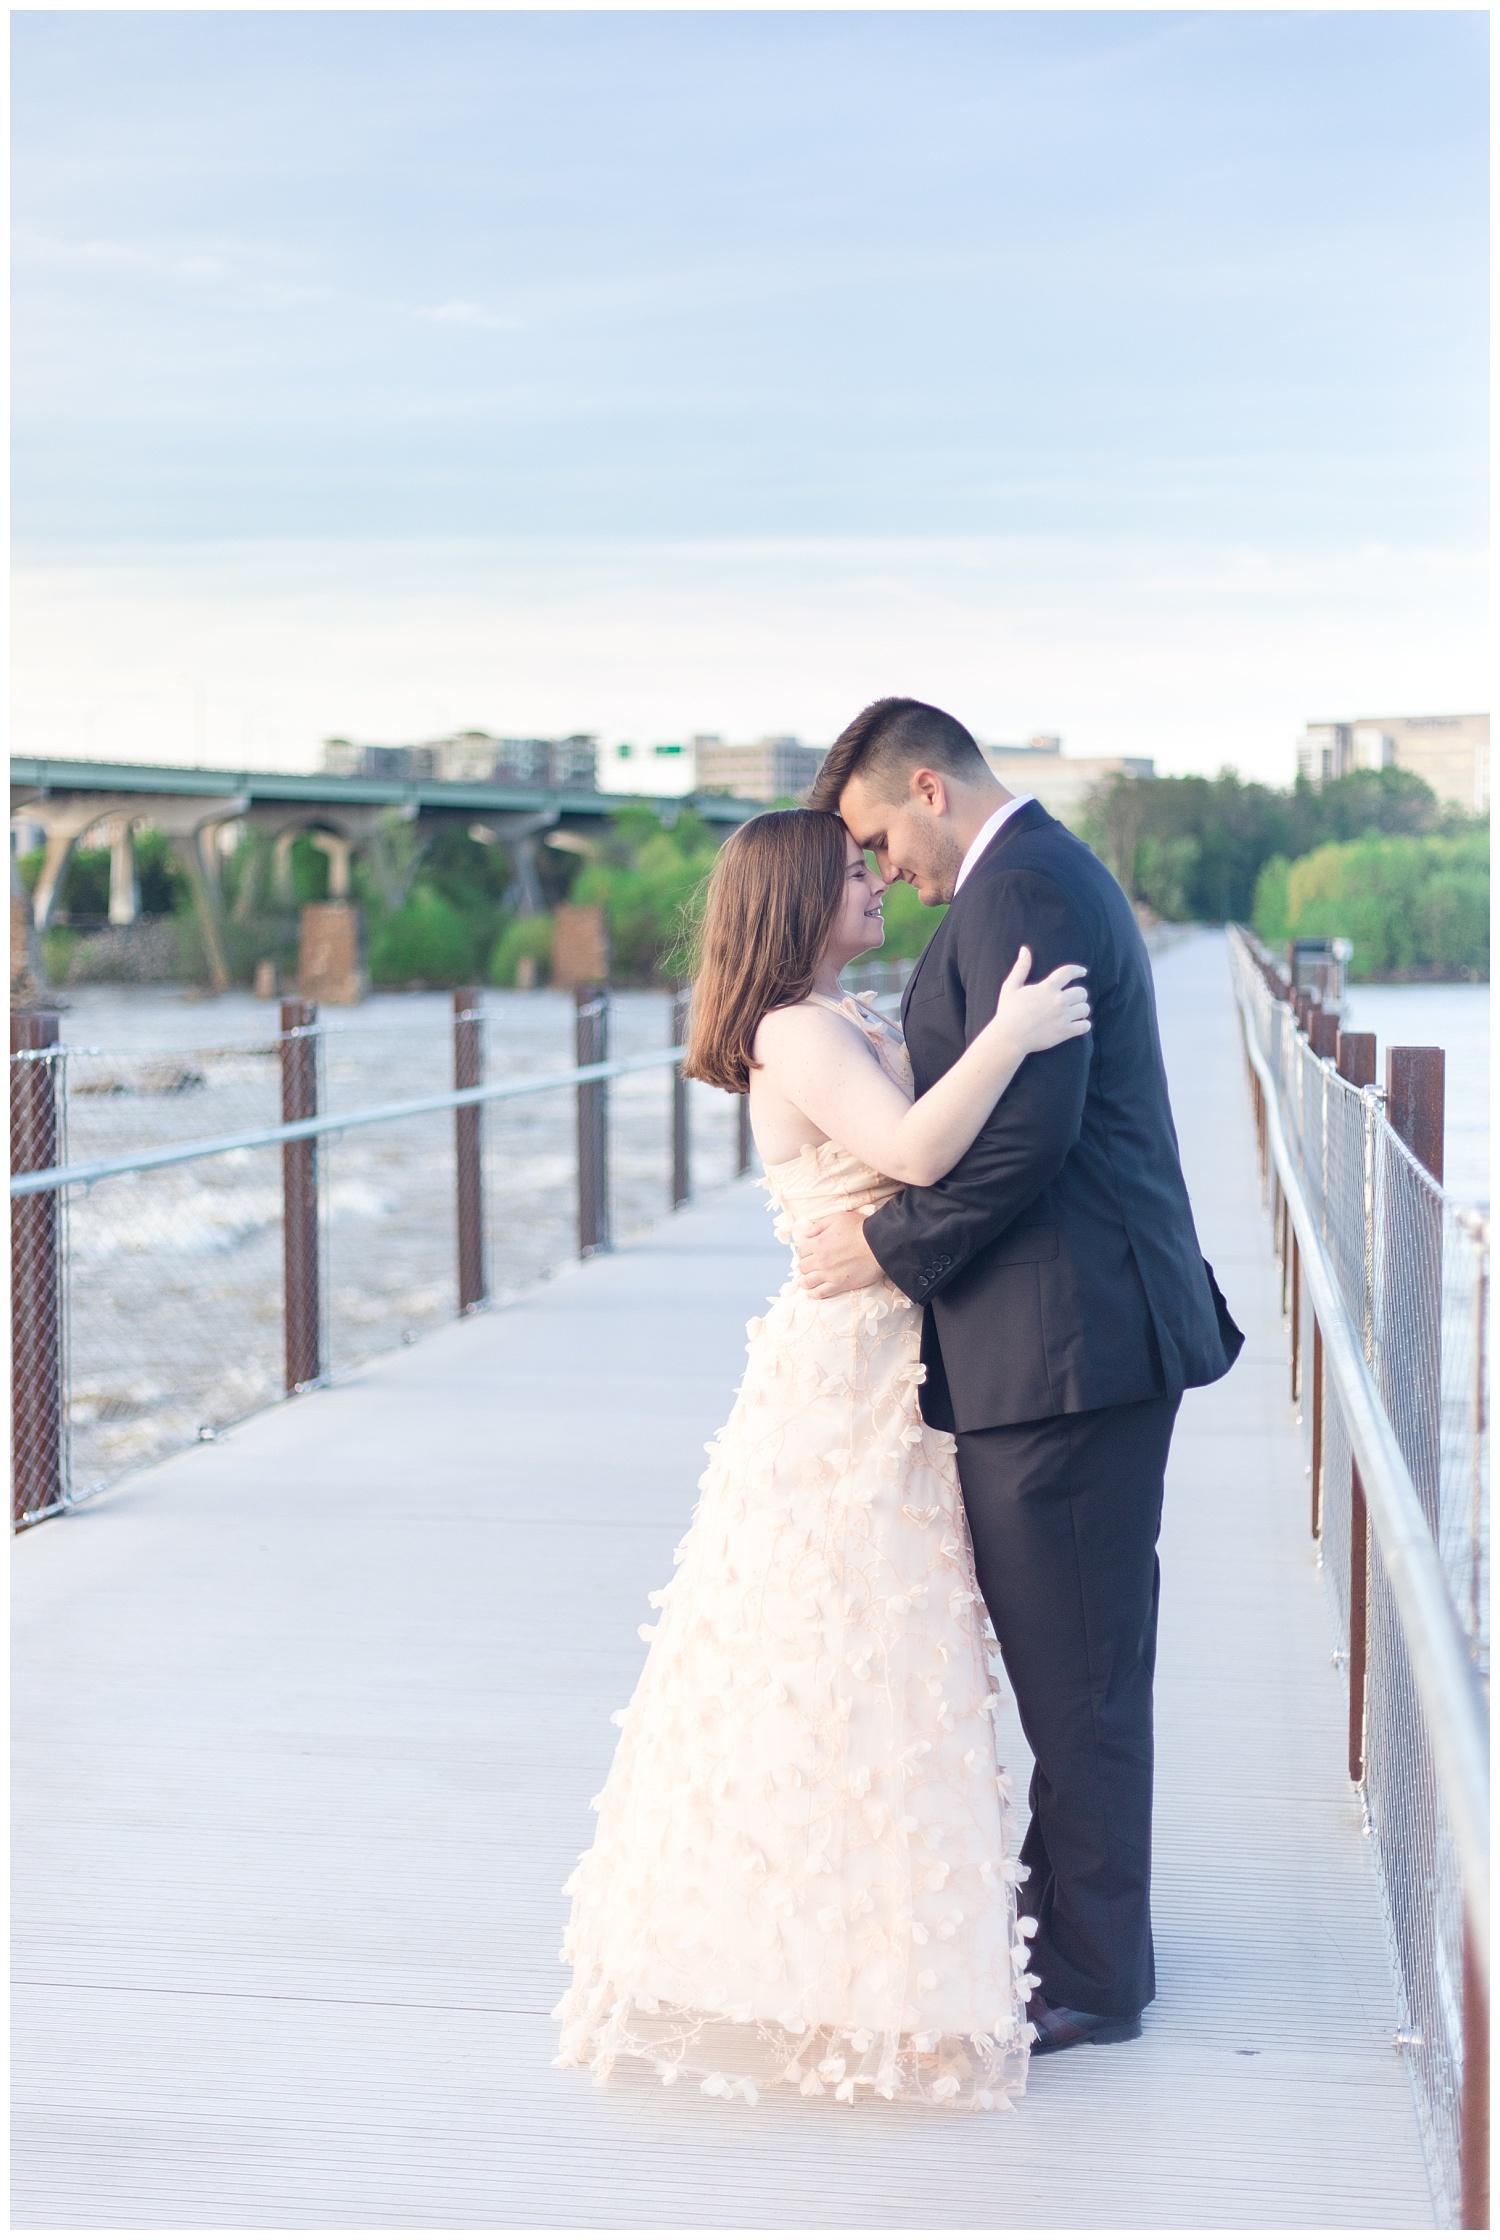 Richmond Wedding Photographer Brown's Island Canal Walk Engagement Photo_0002.jpg